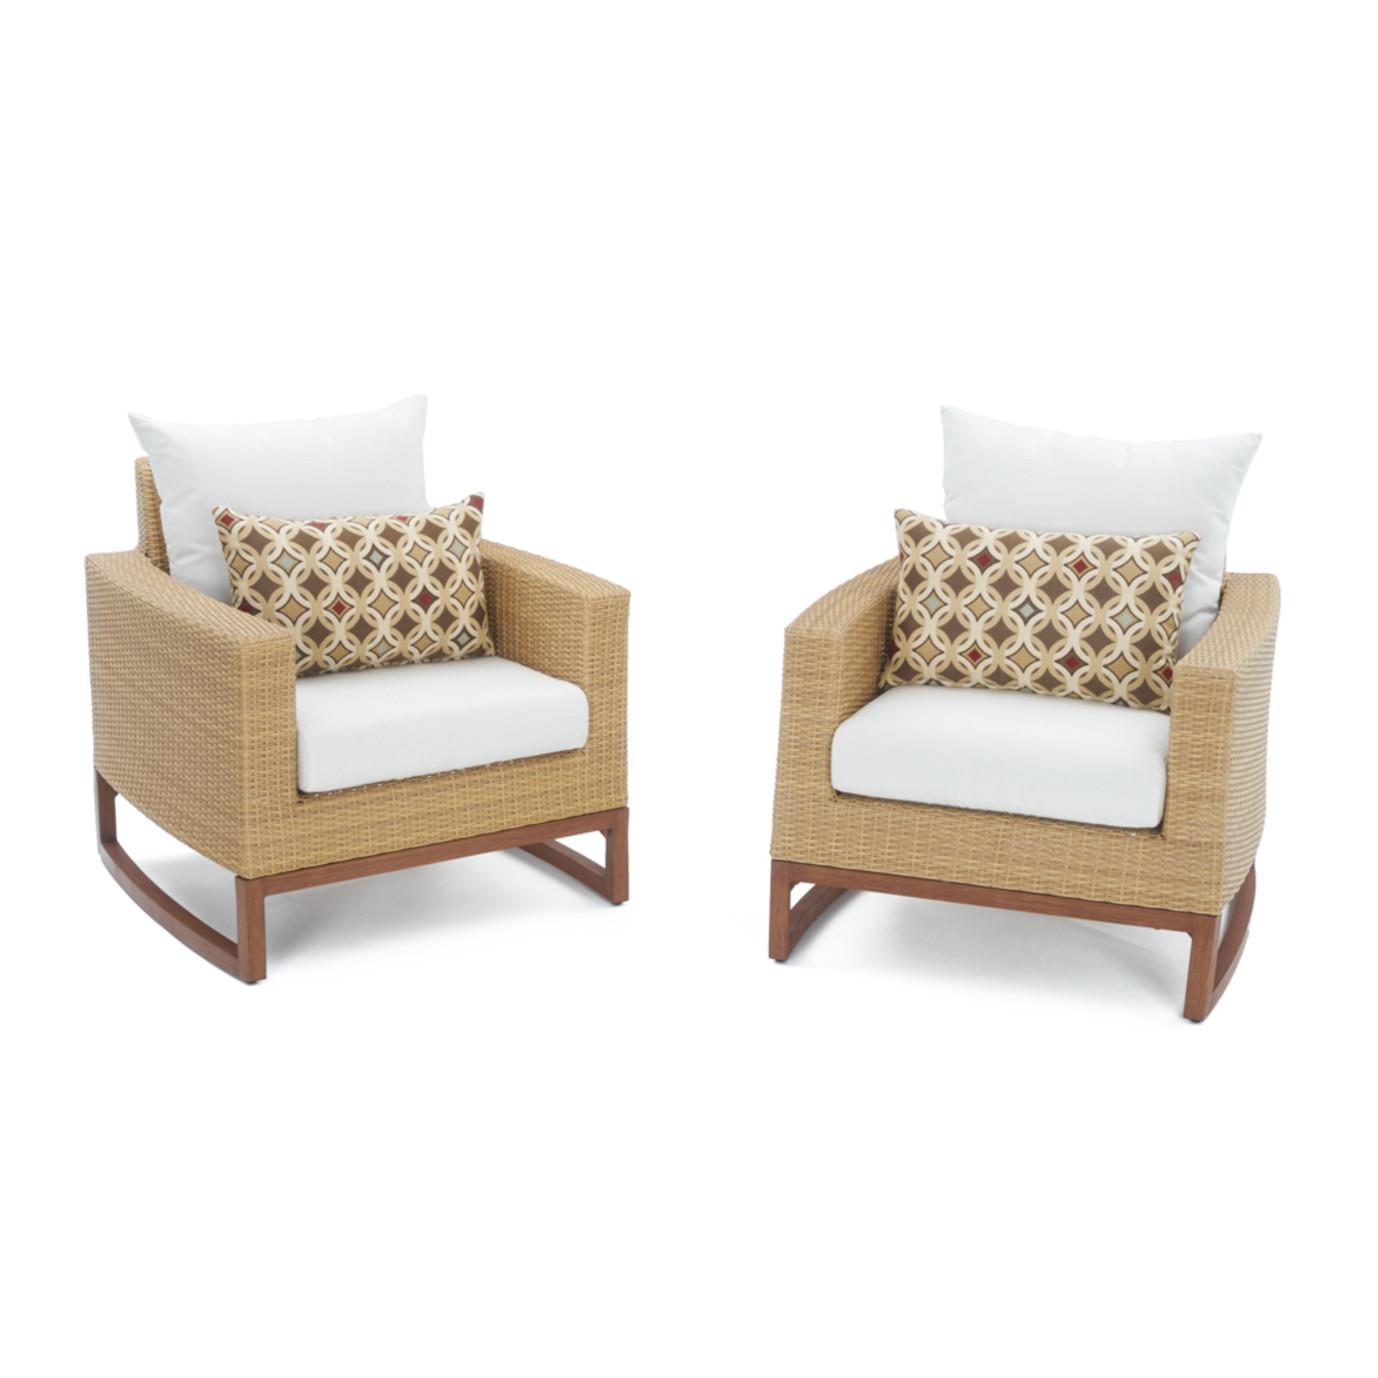 Mili™ 5pc Club Chair & Ottoman Set - Moroccan Cream